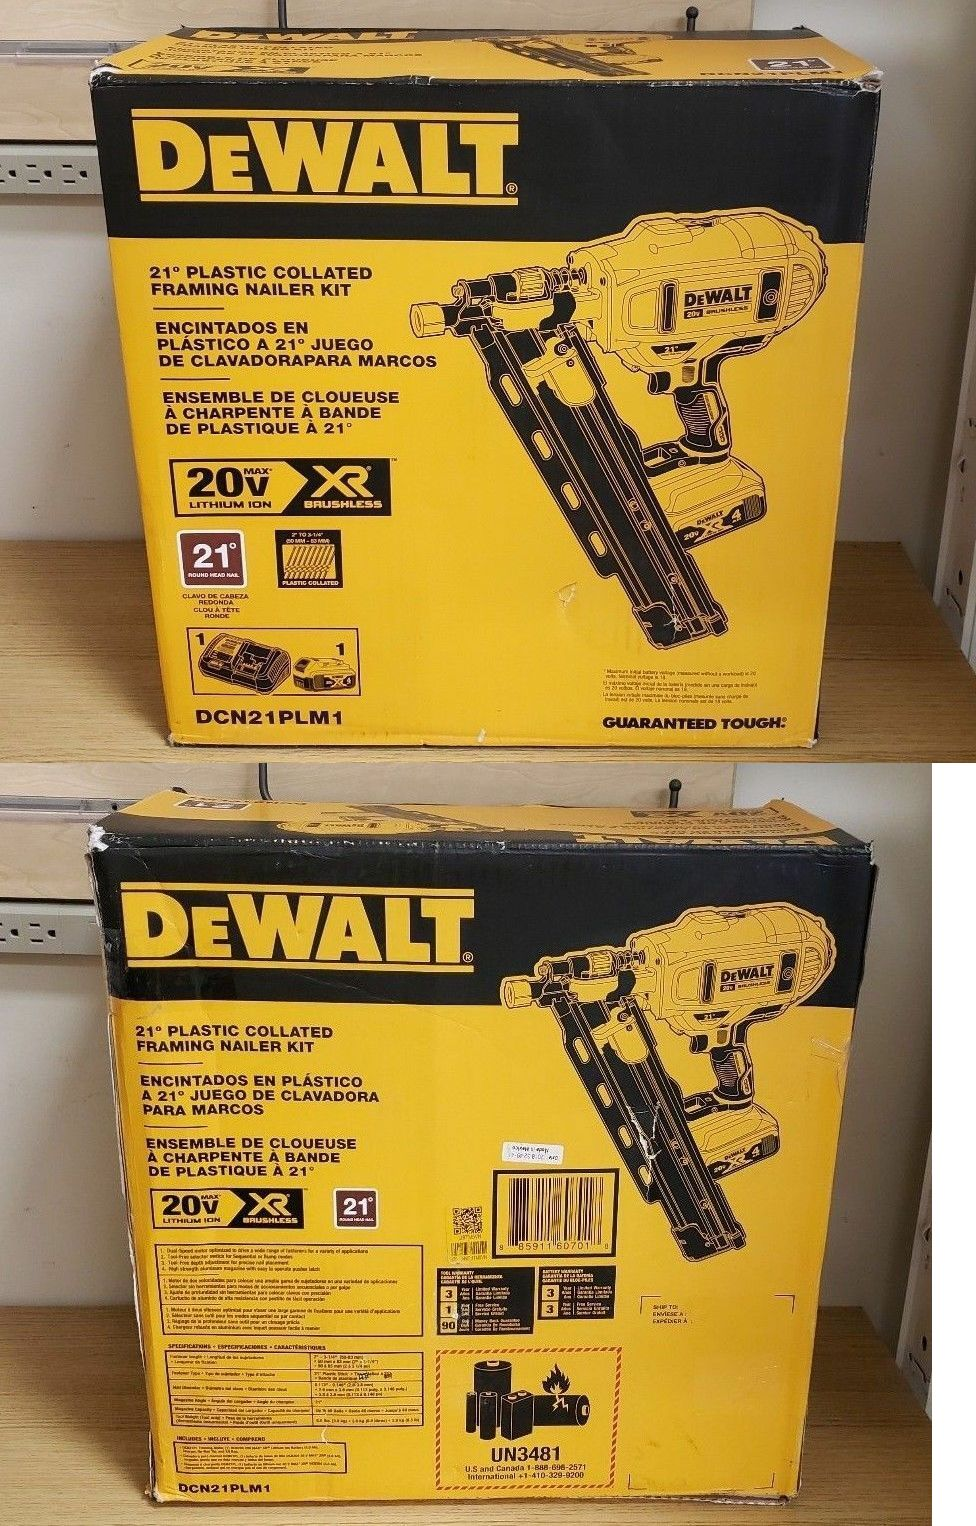 Dewalt Nail Gun Rifle For Sale : dewalt, rifle, DeWalt, DCN21PLM1, Brushless, 21-Degree, Cordless, Framing, Nailer, Nailers,, Dewalt,, Staple